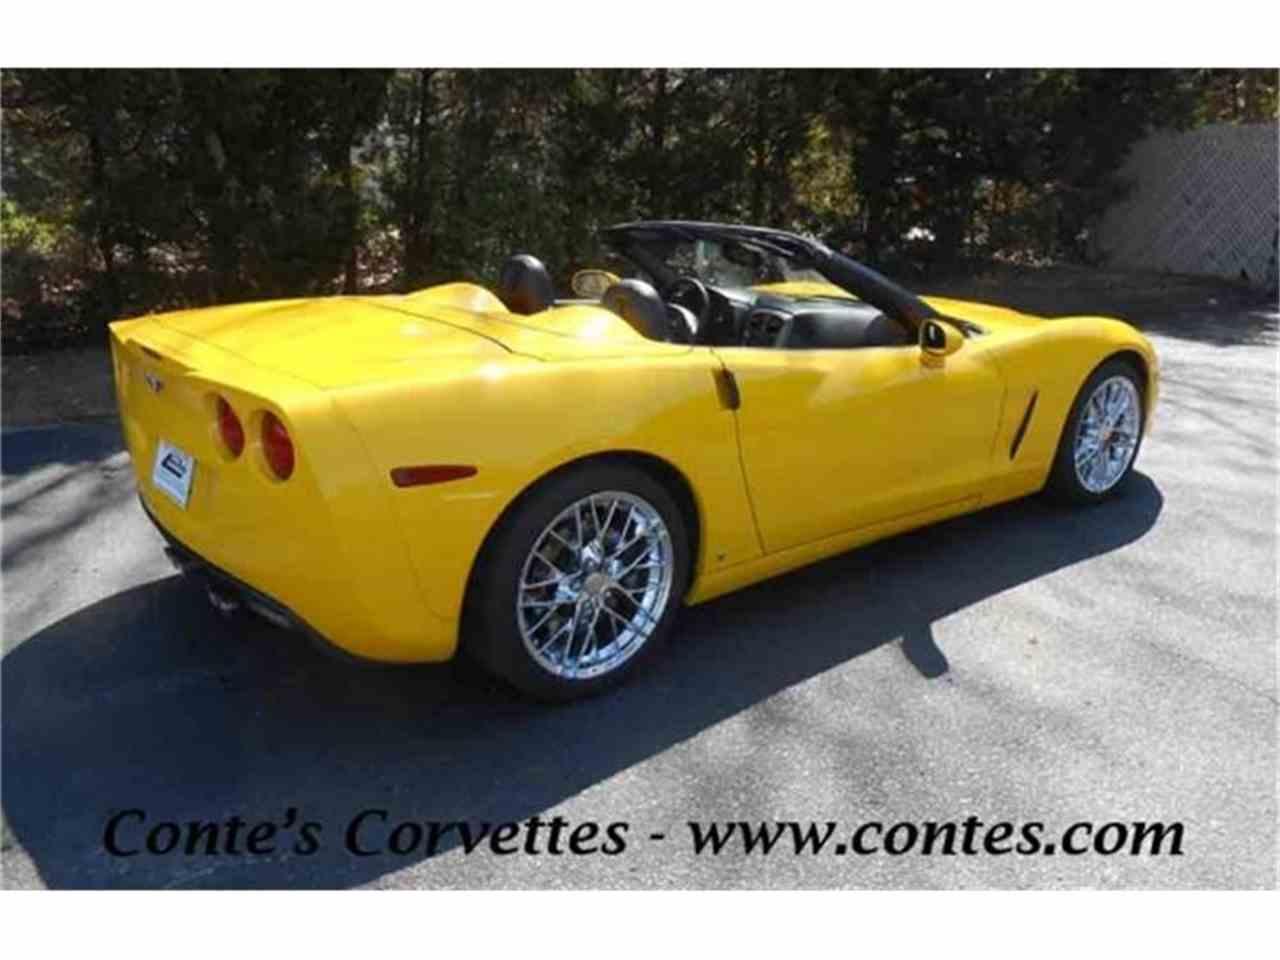 2007 Chevrolet Corvette for Sale | ClassicCars.com | CC-881318